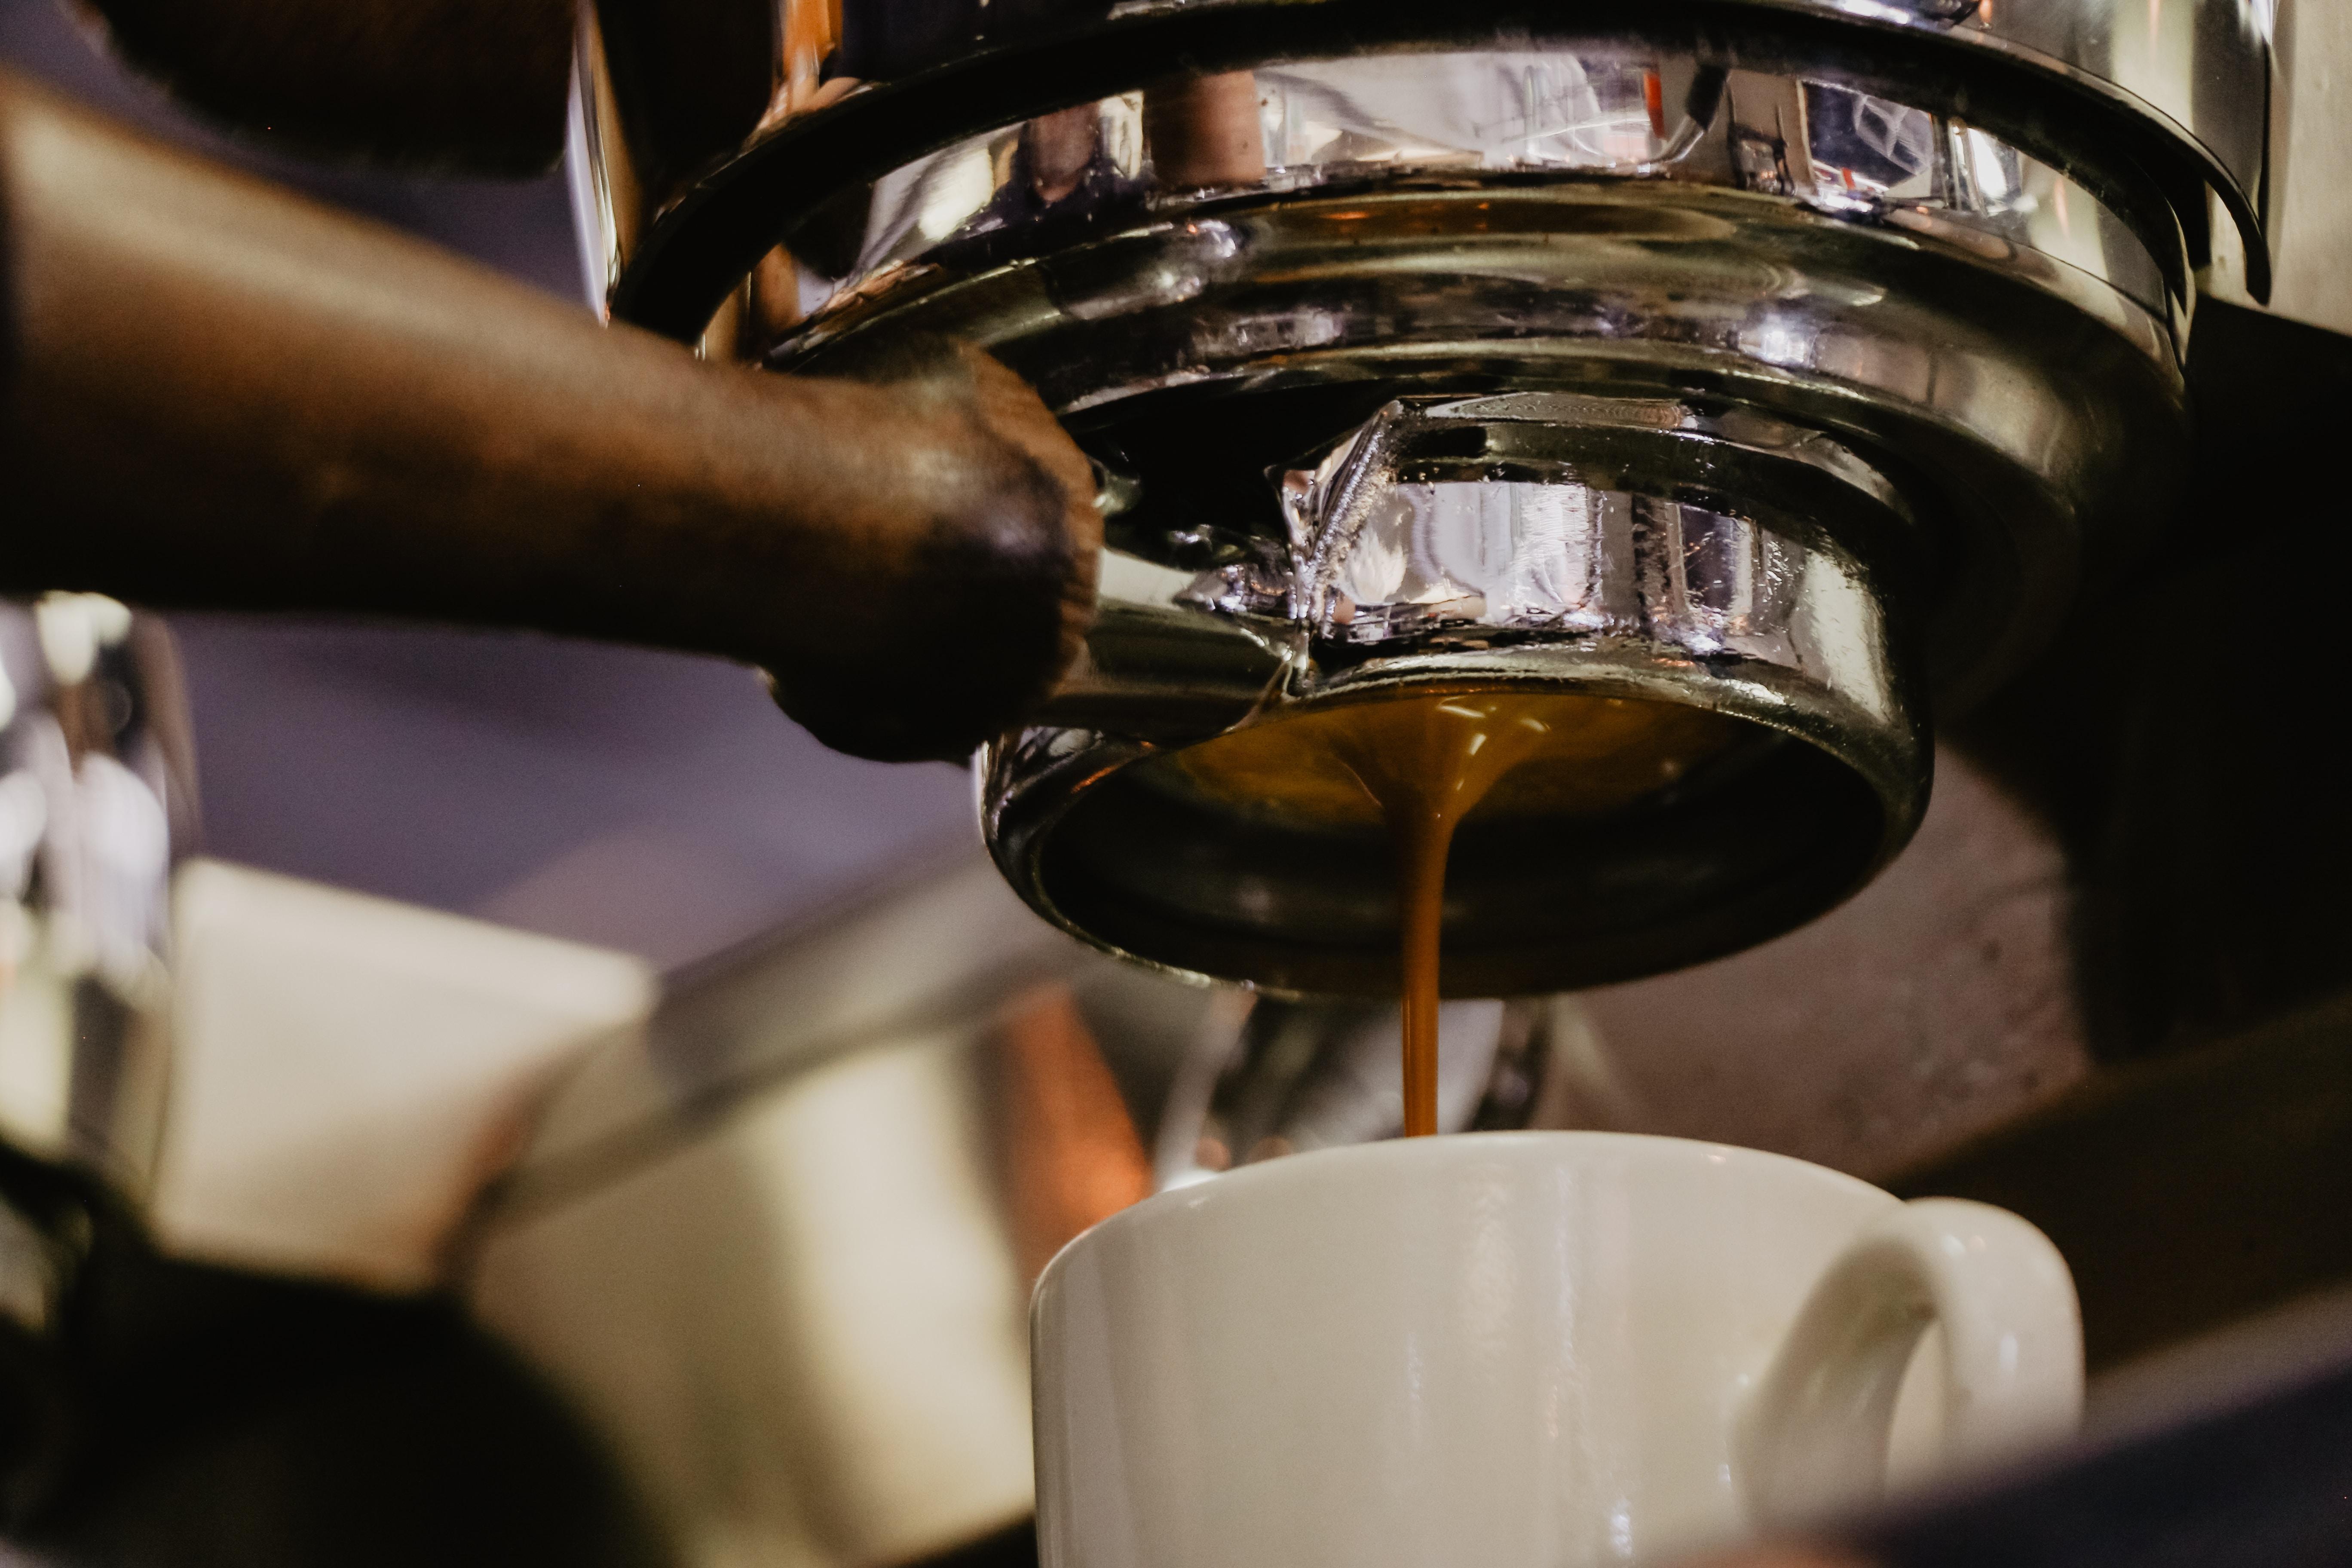 Vakantie in Italië - koffie